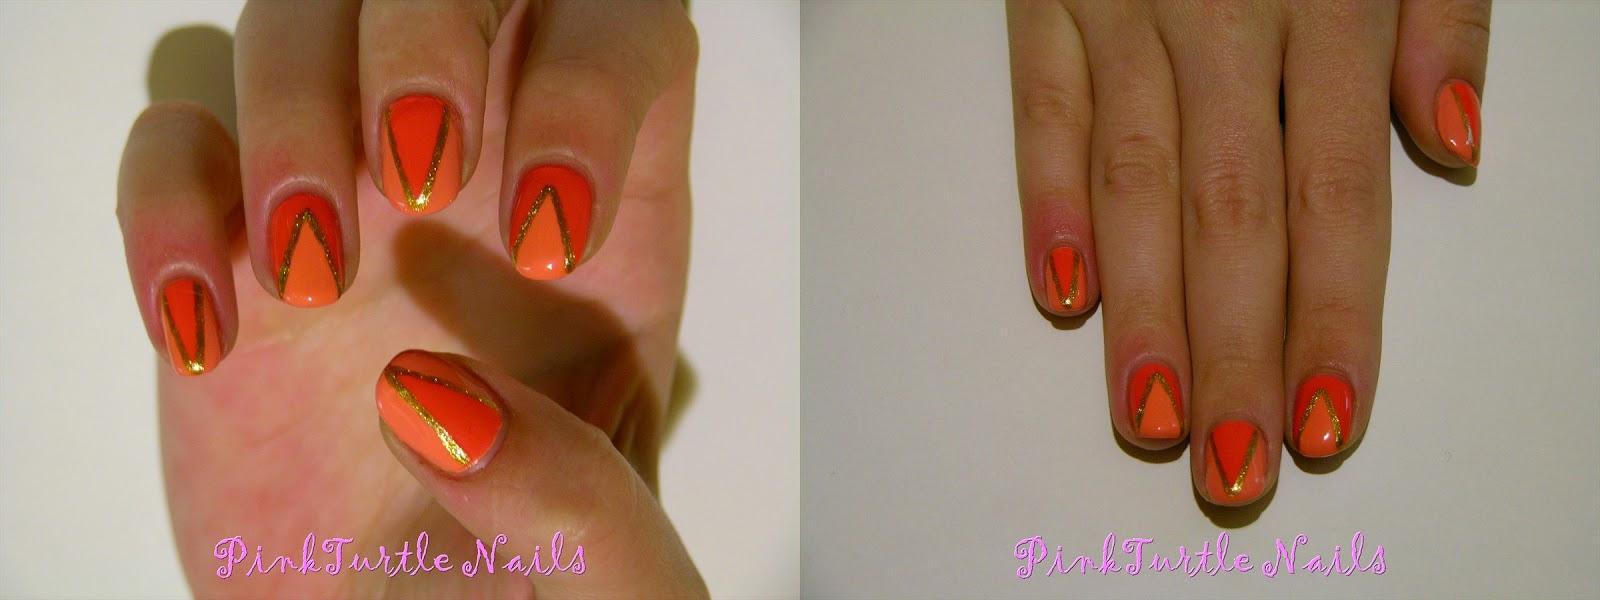 http://pinkturtlenails.blogspot.com.es/2015/03/reto-31-dias-naranja.html